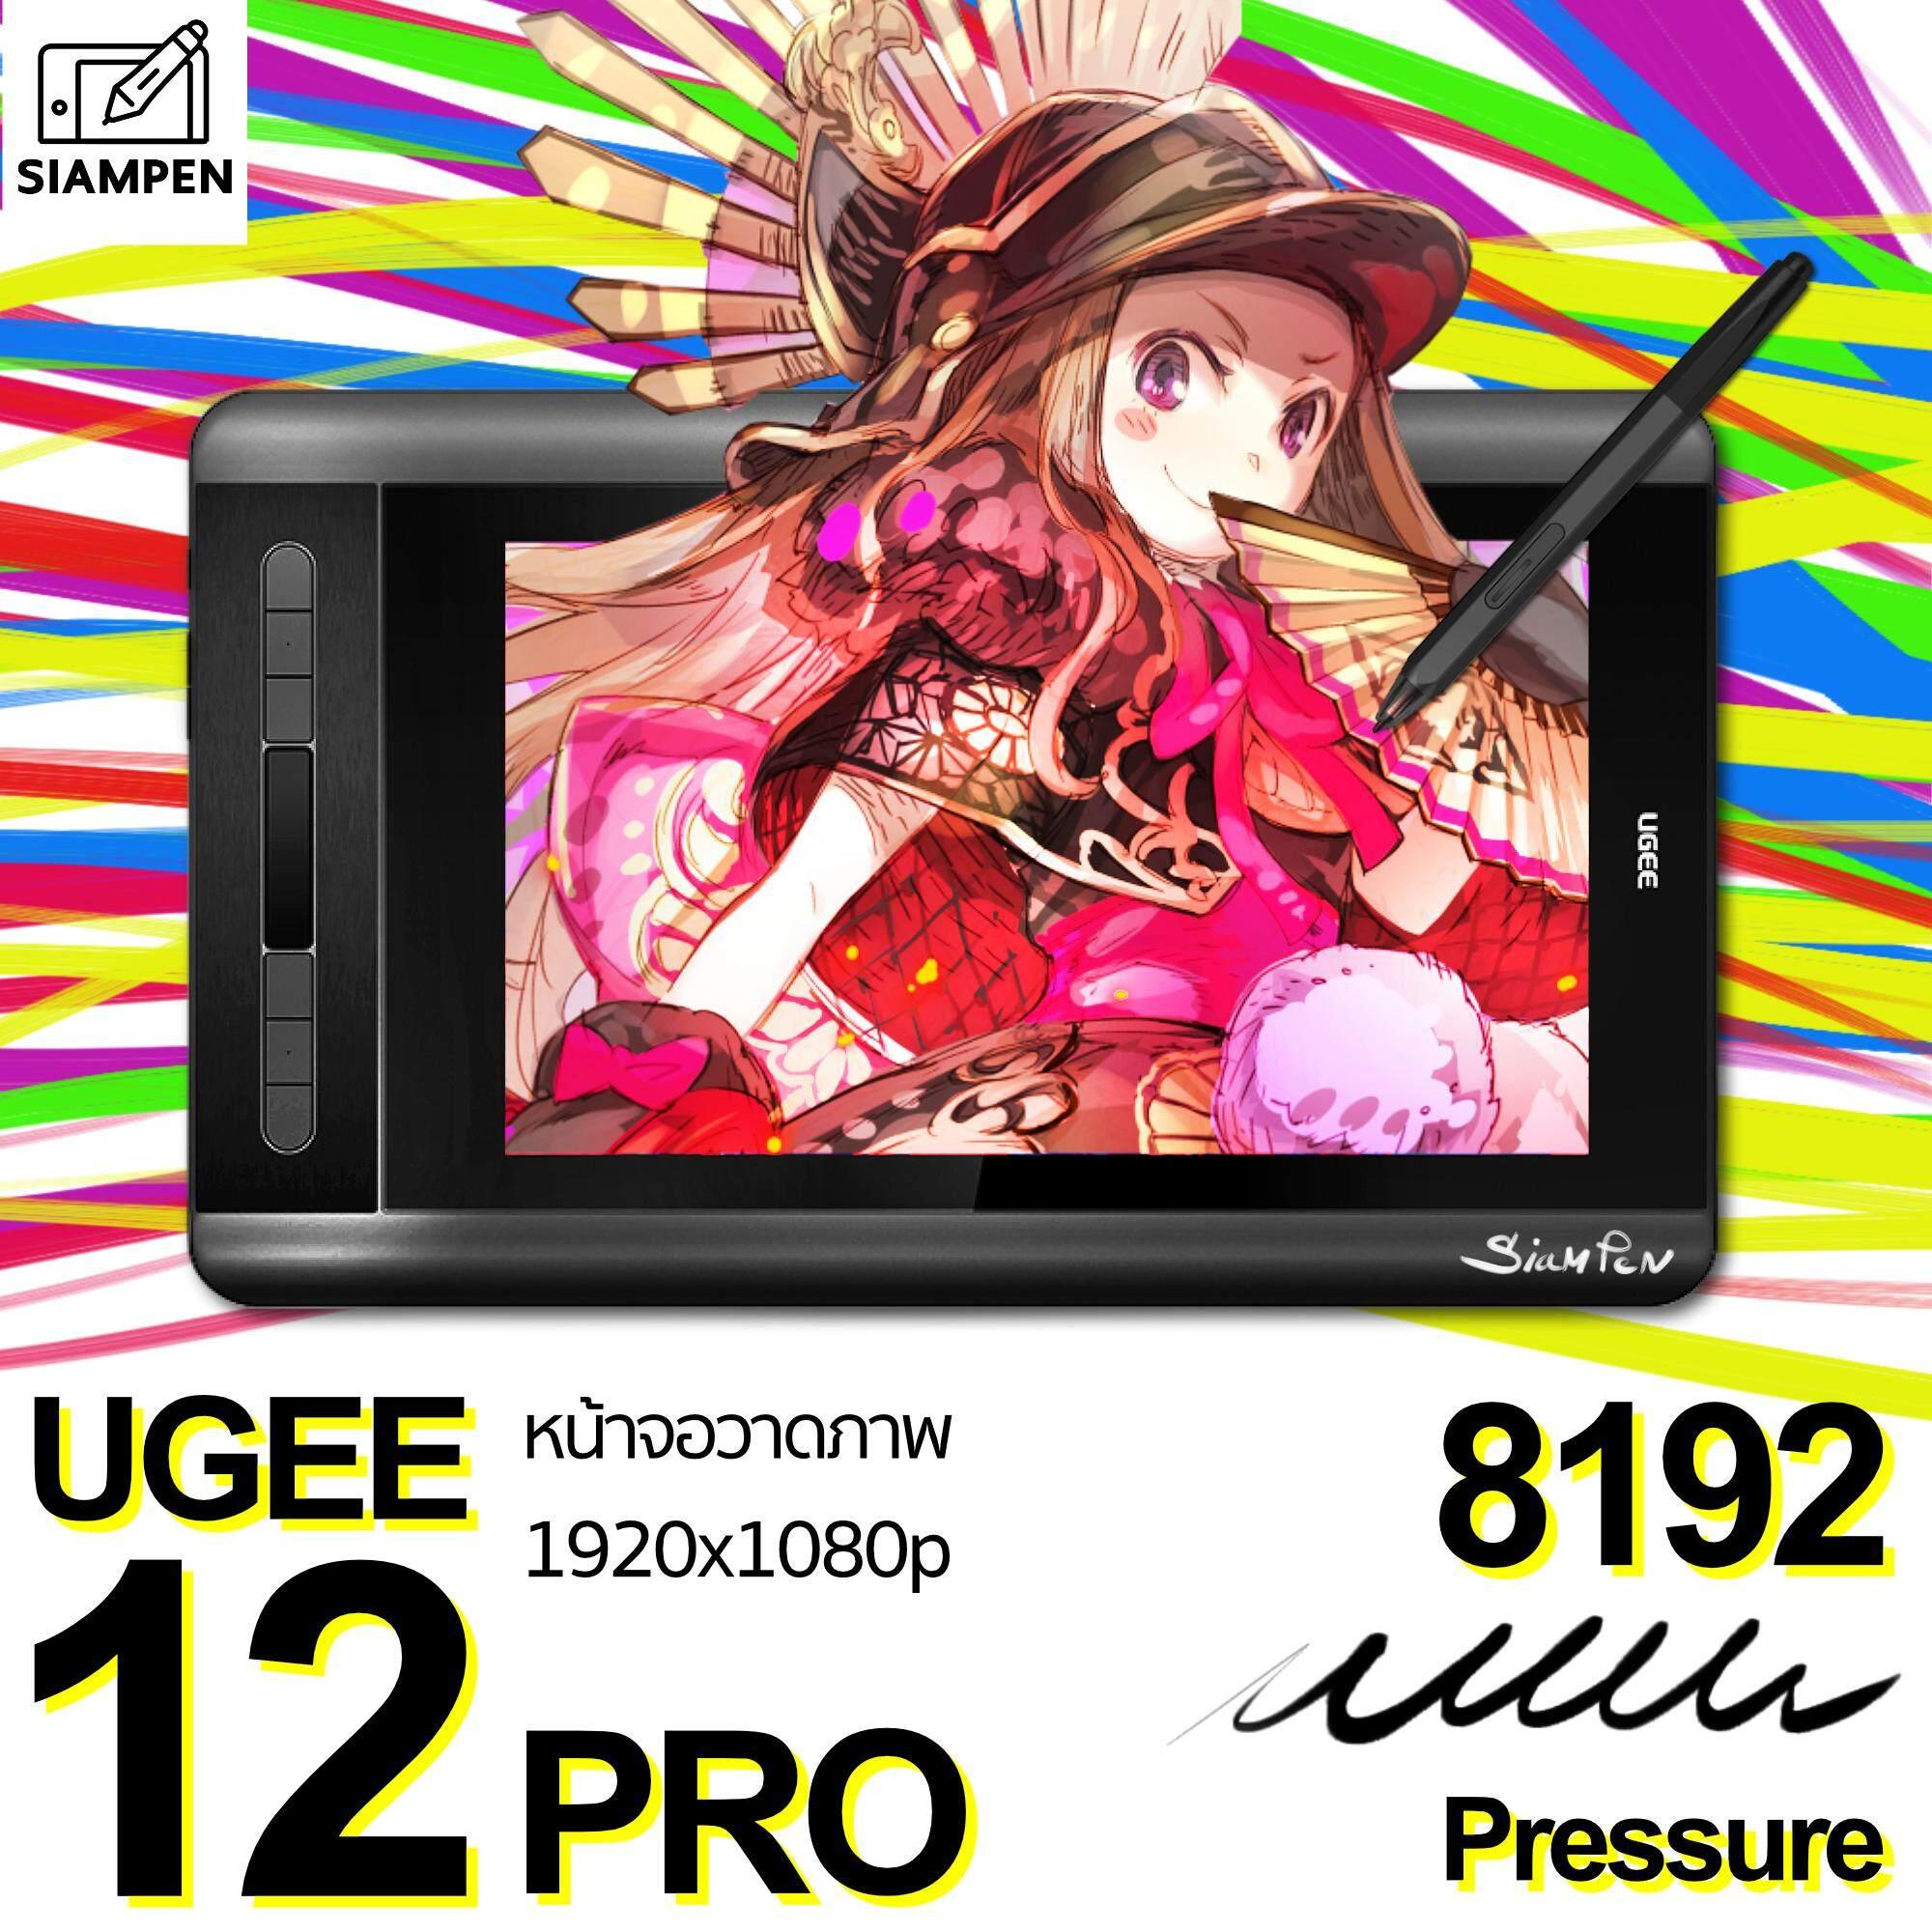 Promotion ! รุ่นใหม่ ! หน้าจอวาดภาพ 12 นิ้ว UGEE 12 Pro เม้าส์ปากกา แรงกด  8192 ระดับ ความละเอียด 1980x1080 Full HD IPS Drawing Monitor มอนิเตอร์